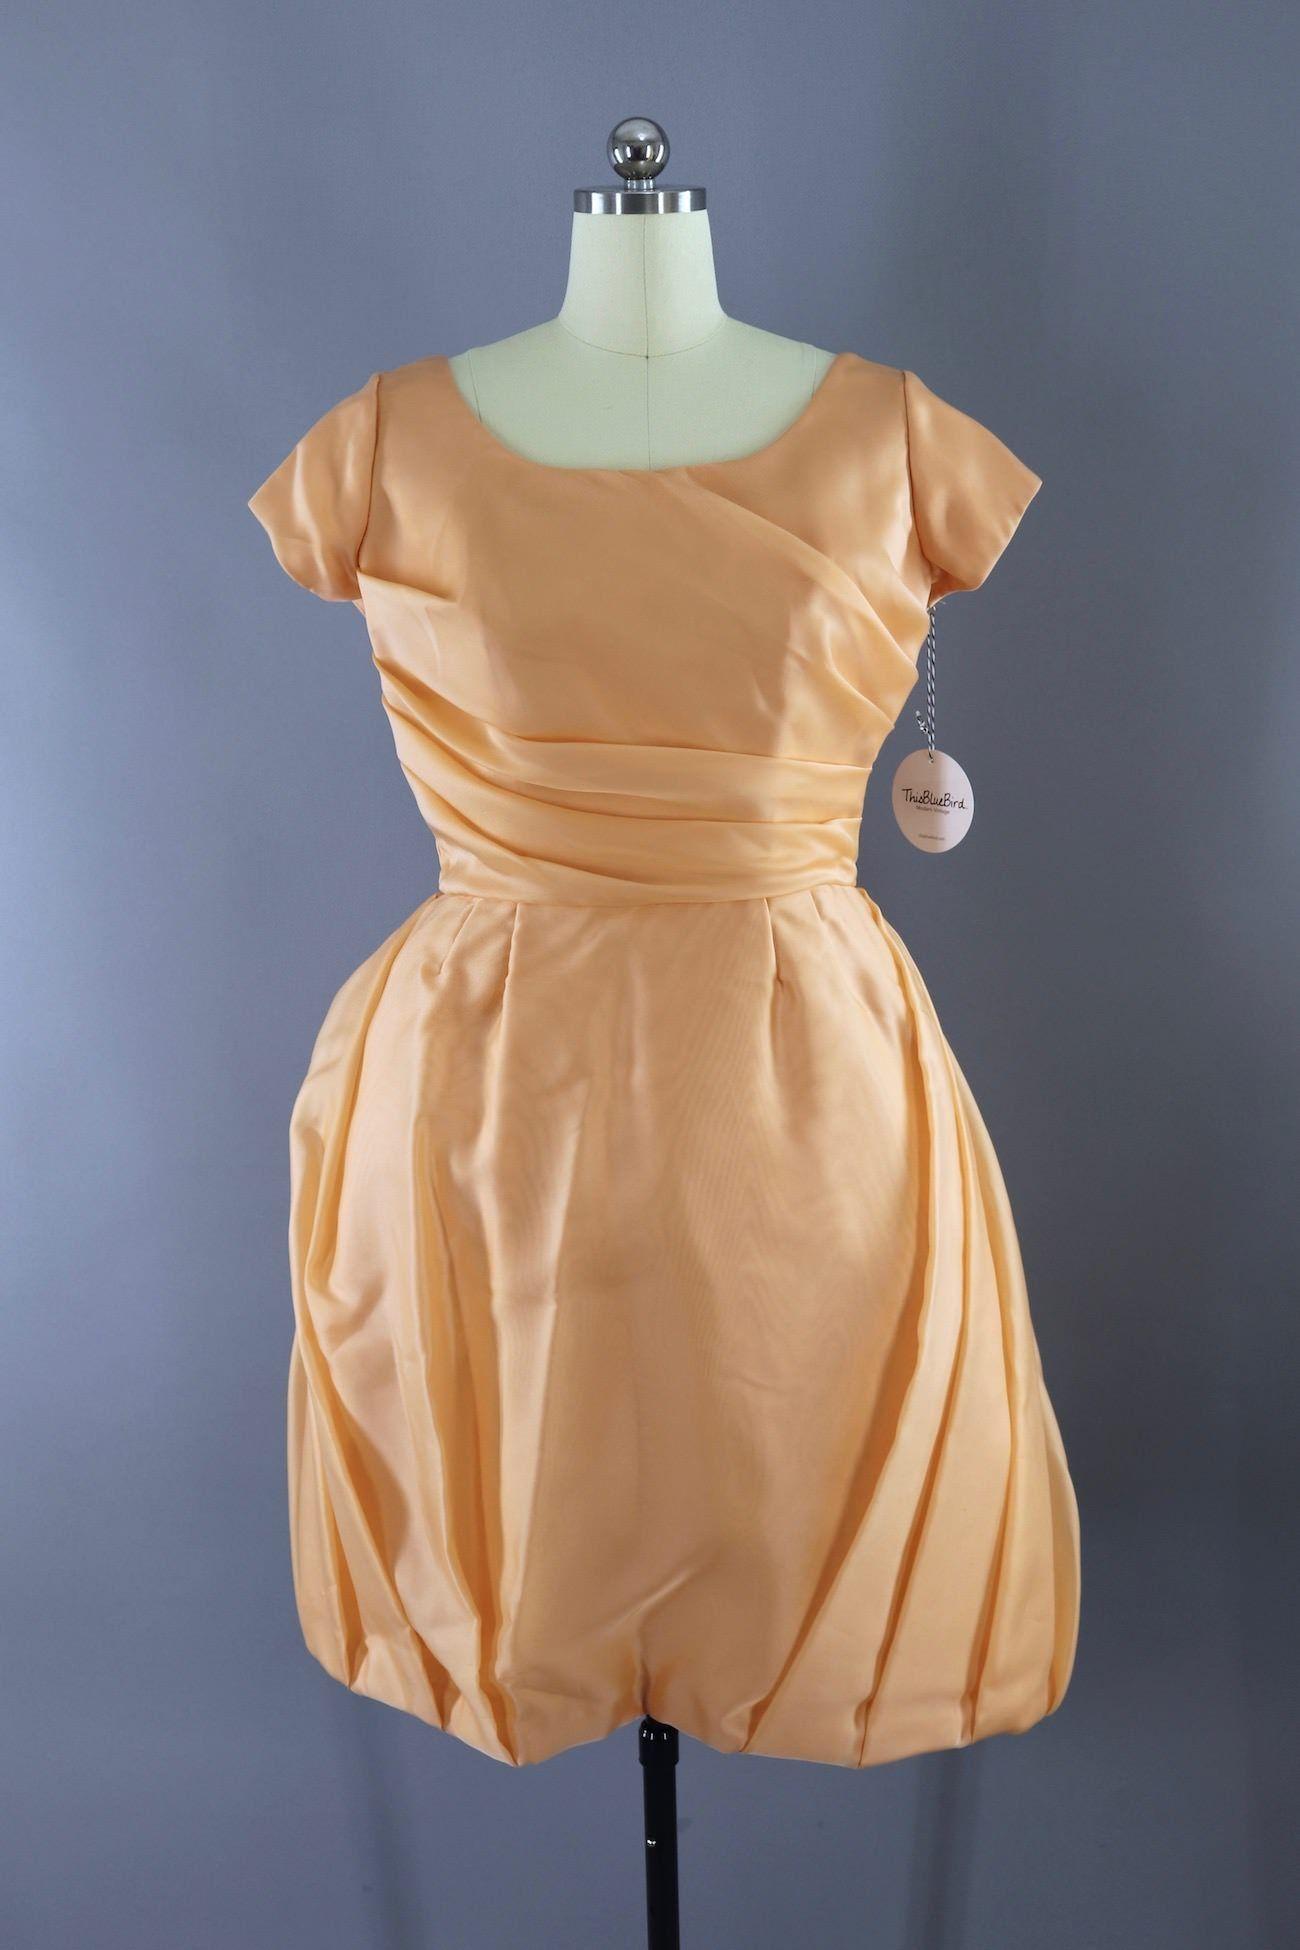 Vintage 1960s Peach Chiffon Cocktail Dress Cocktail Dress Vintage Chiffon Cocktail Dress Summer Cocktail Dress [ 1950 x 1300 Pixel ]